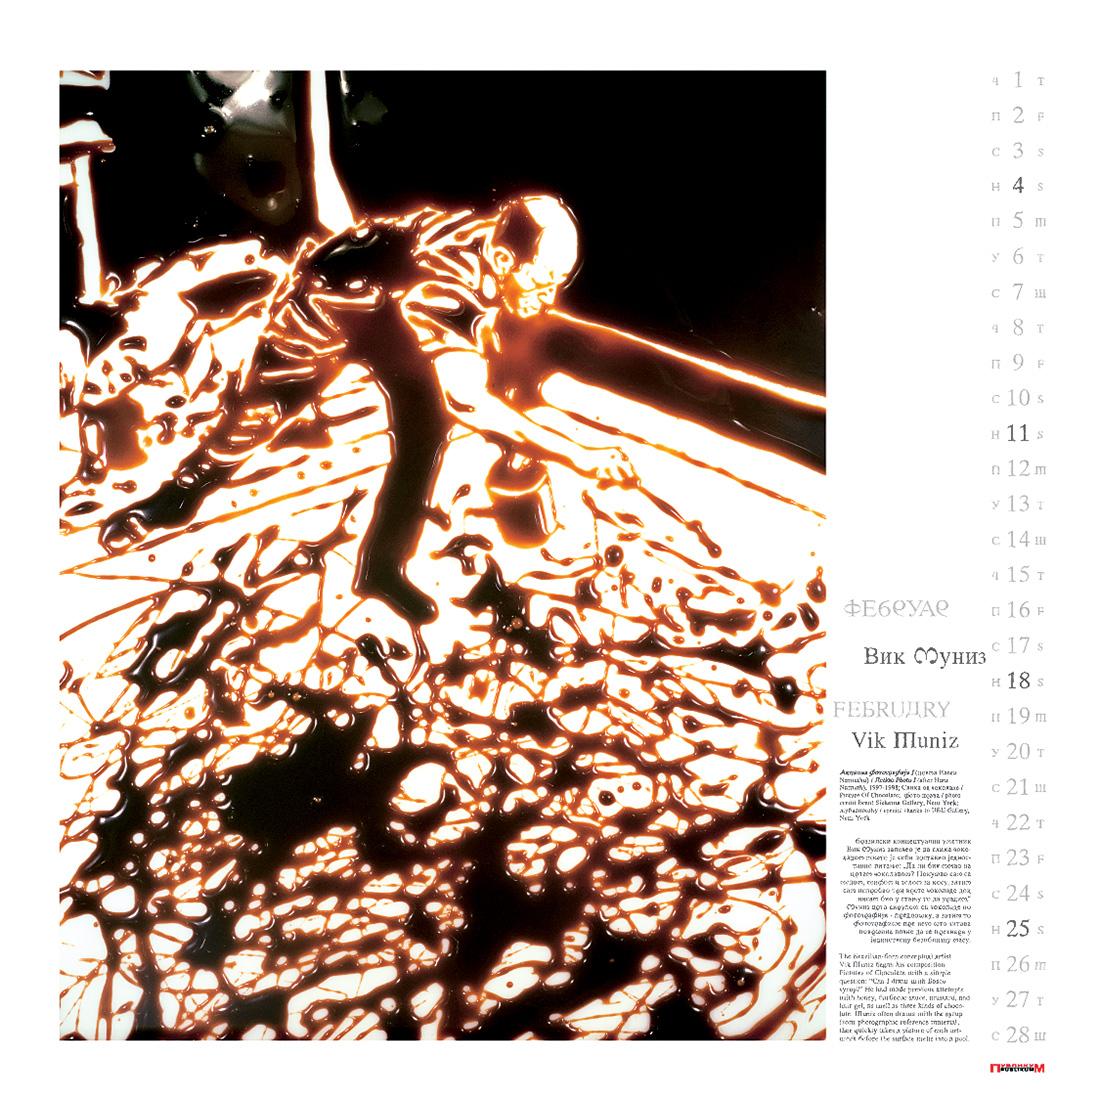 Publikum Calendar Antiwall,